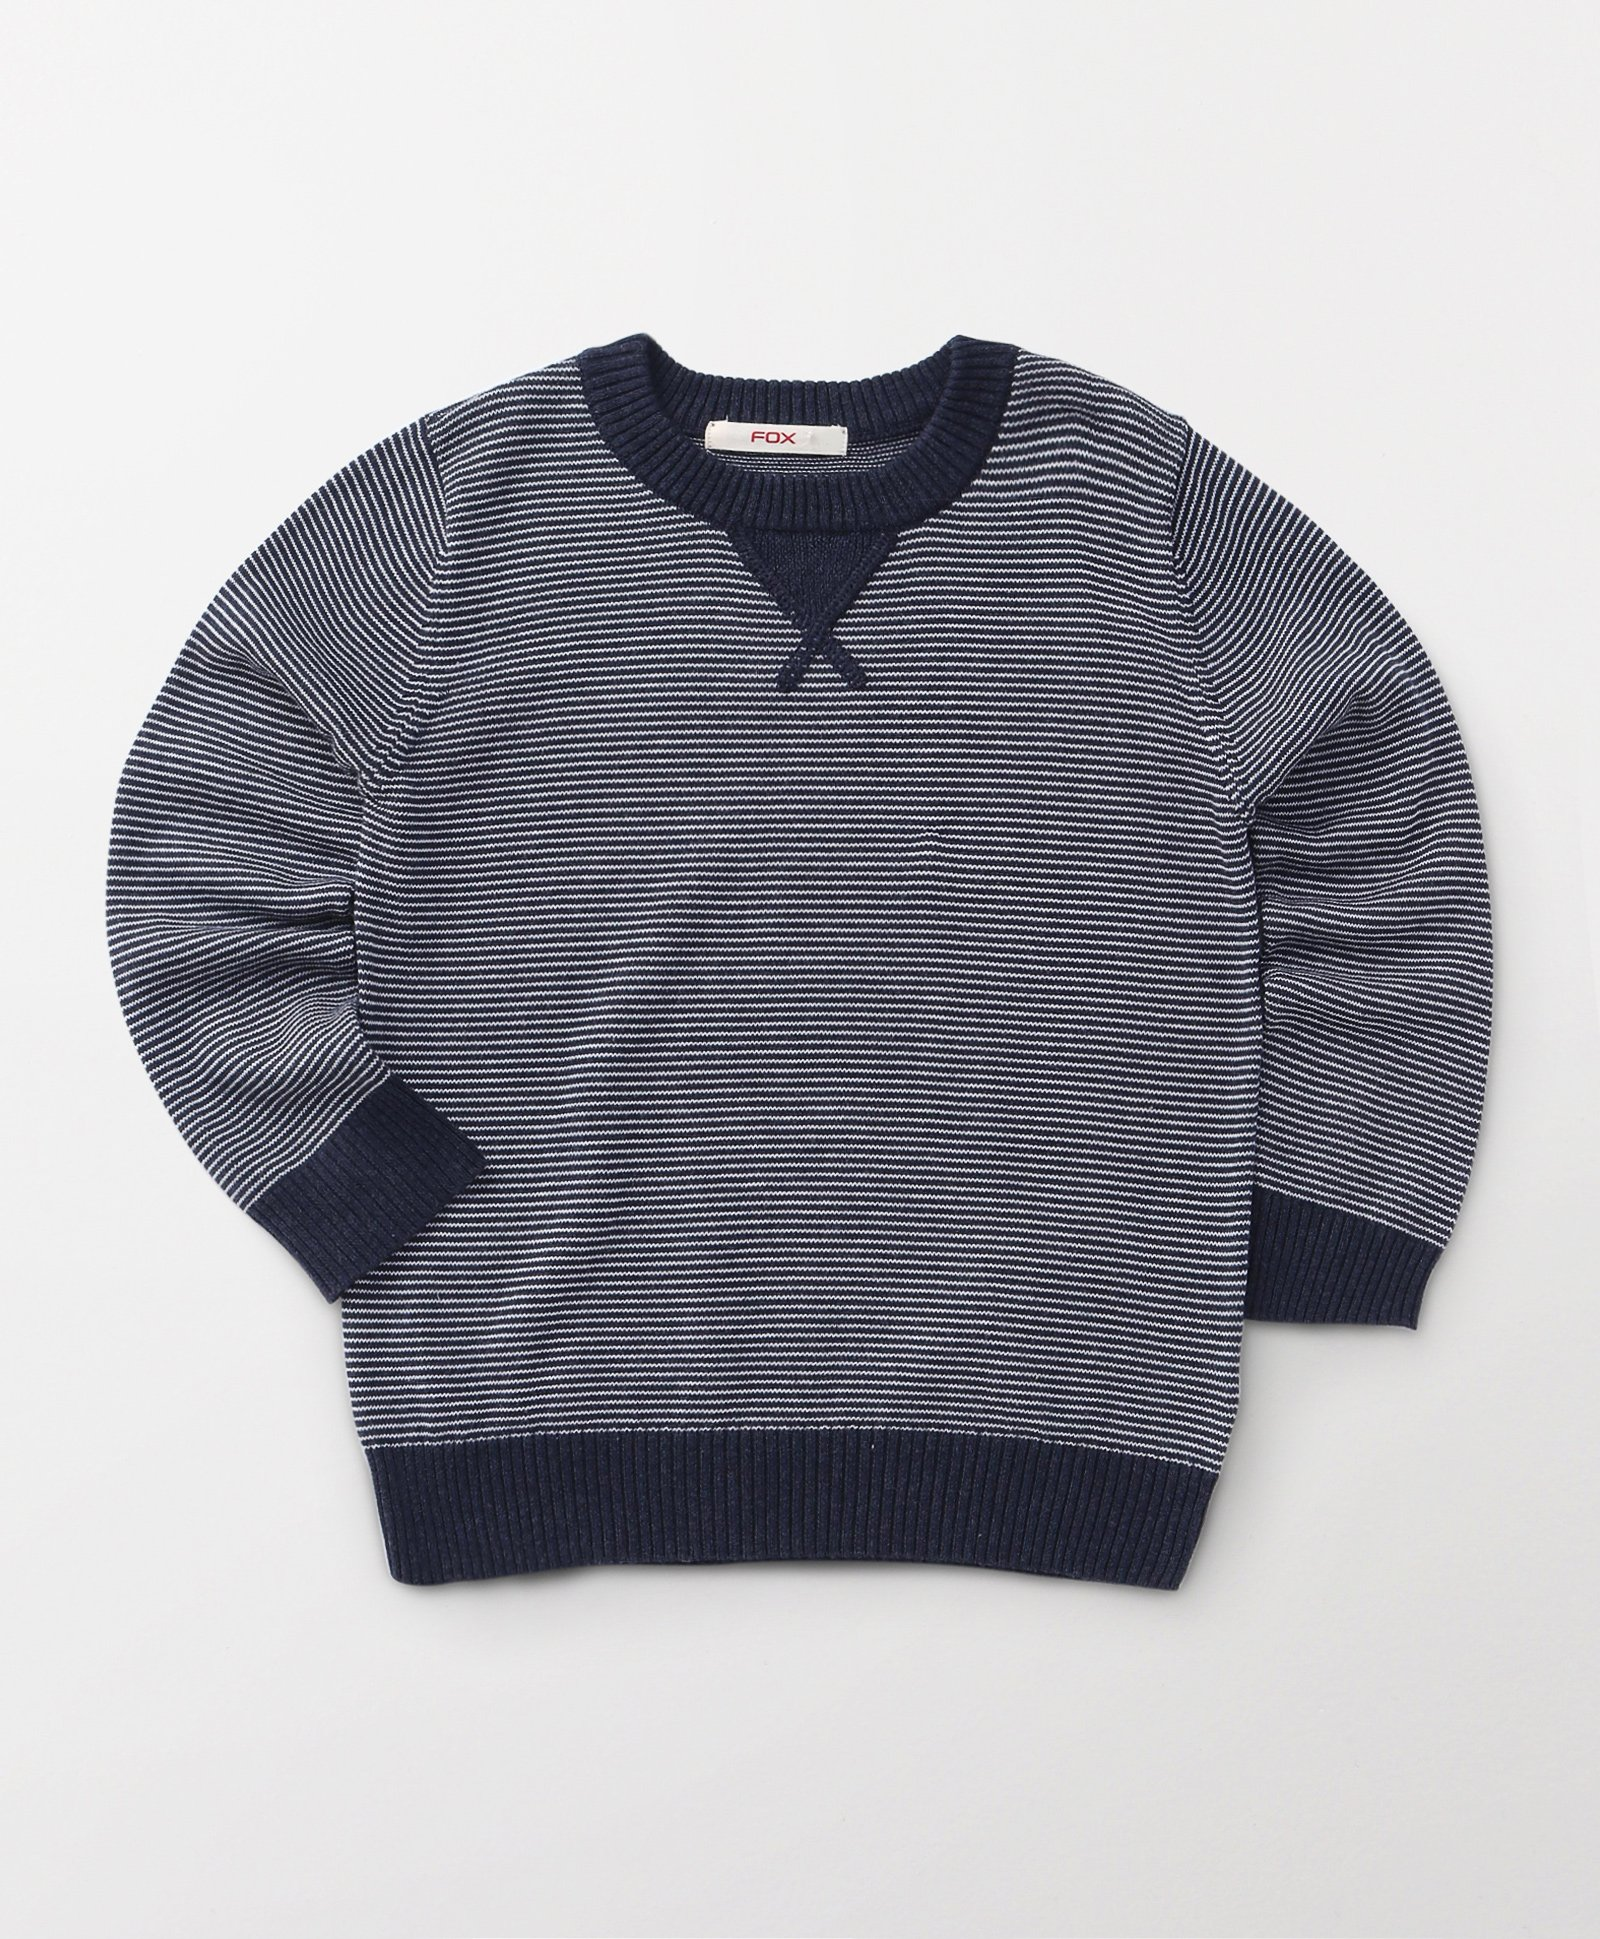 Fox Baby Full Sleeves Sweatshirts - Blue